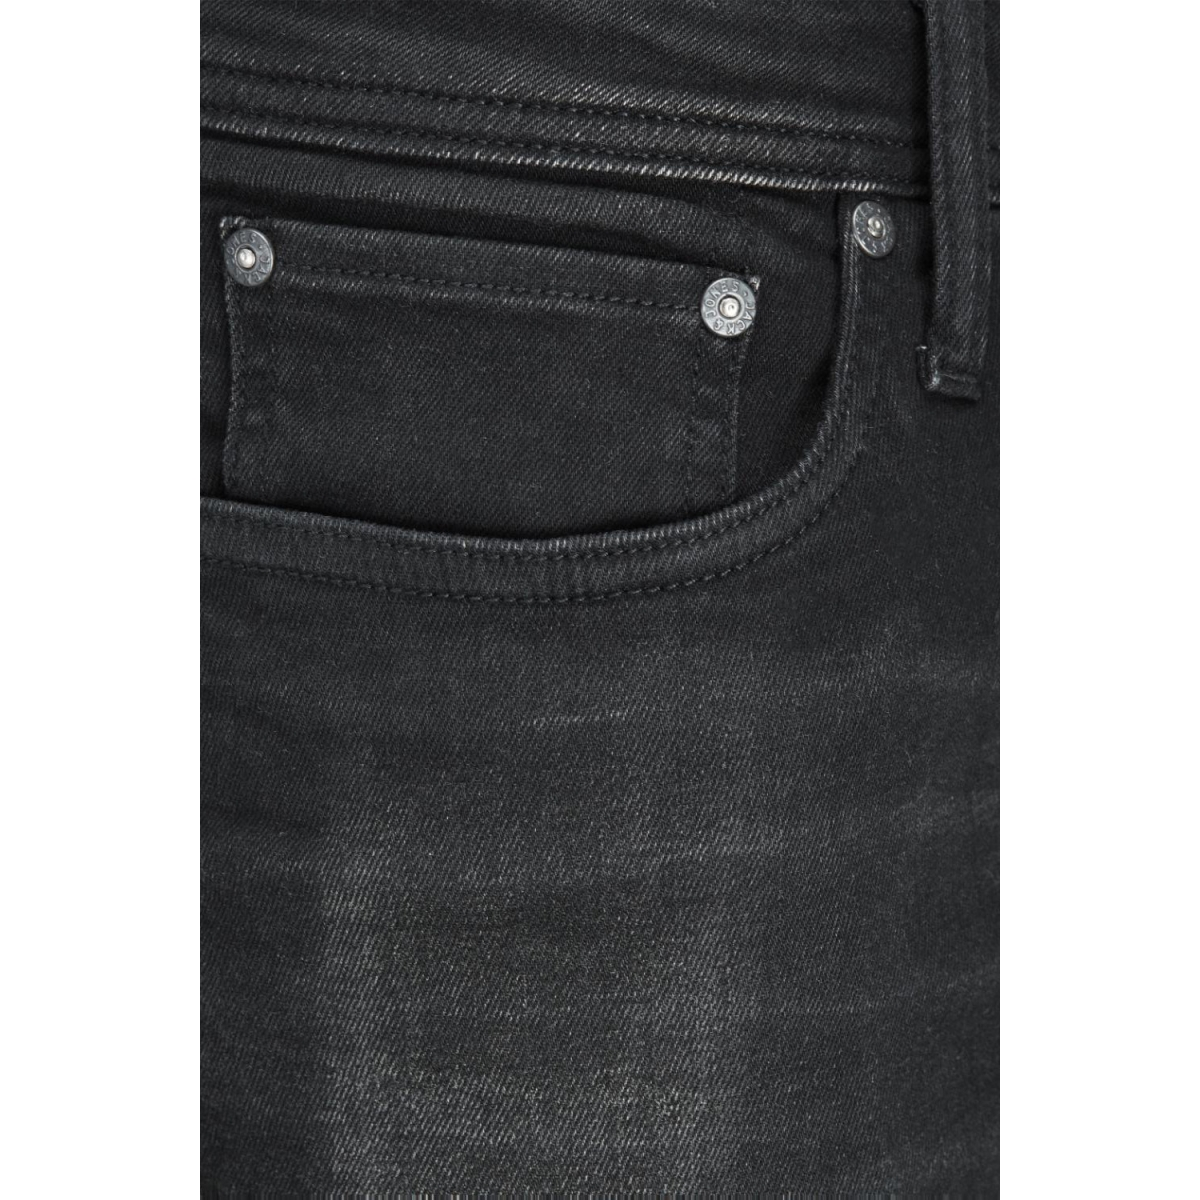 jjitim jjoriginal am 652 12129894 jack & jones jeans black denim